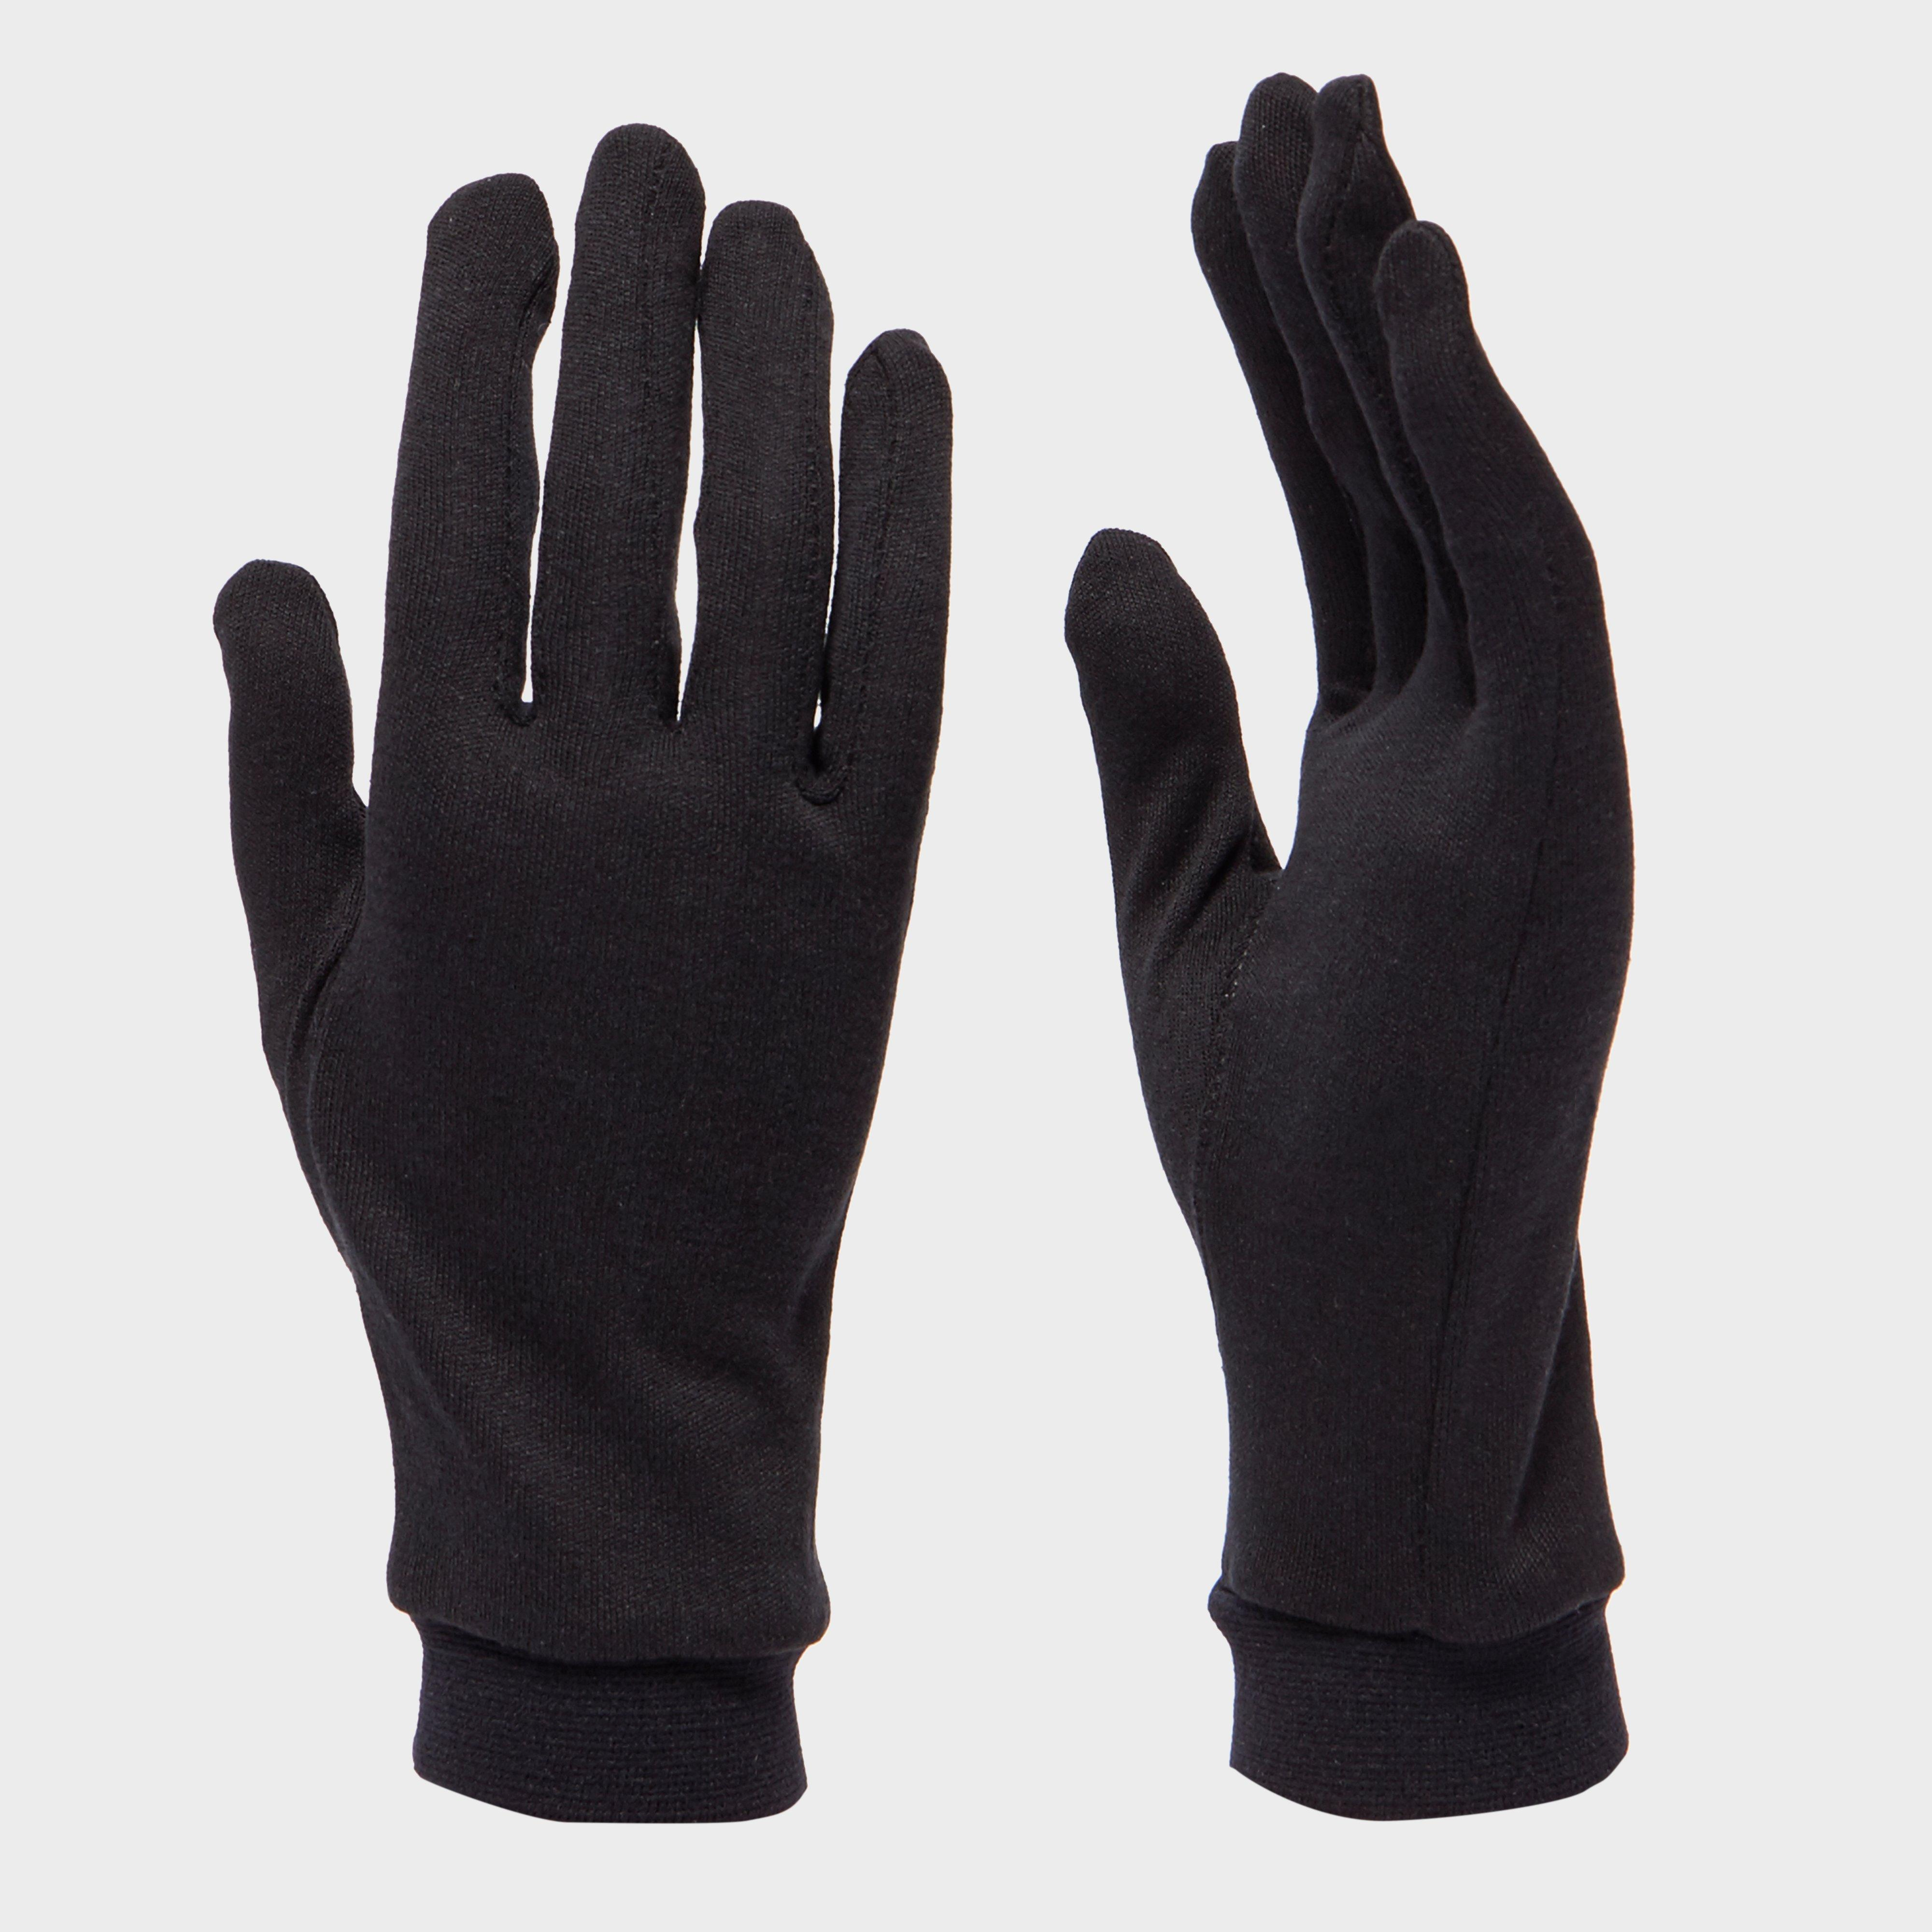 Trekmates Unisex Silk Gloves - Black, Black